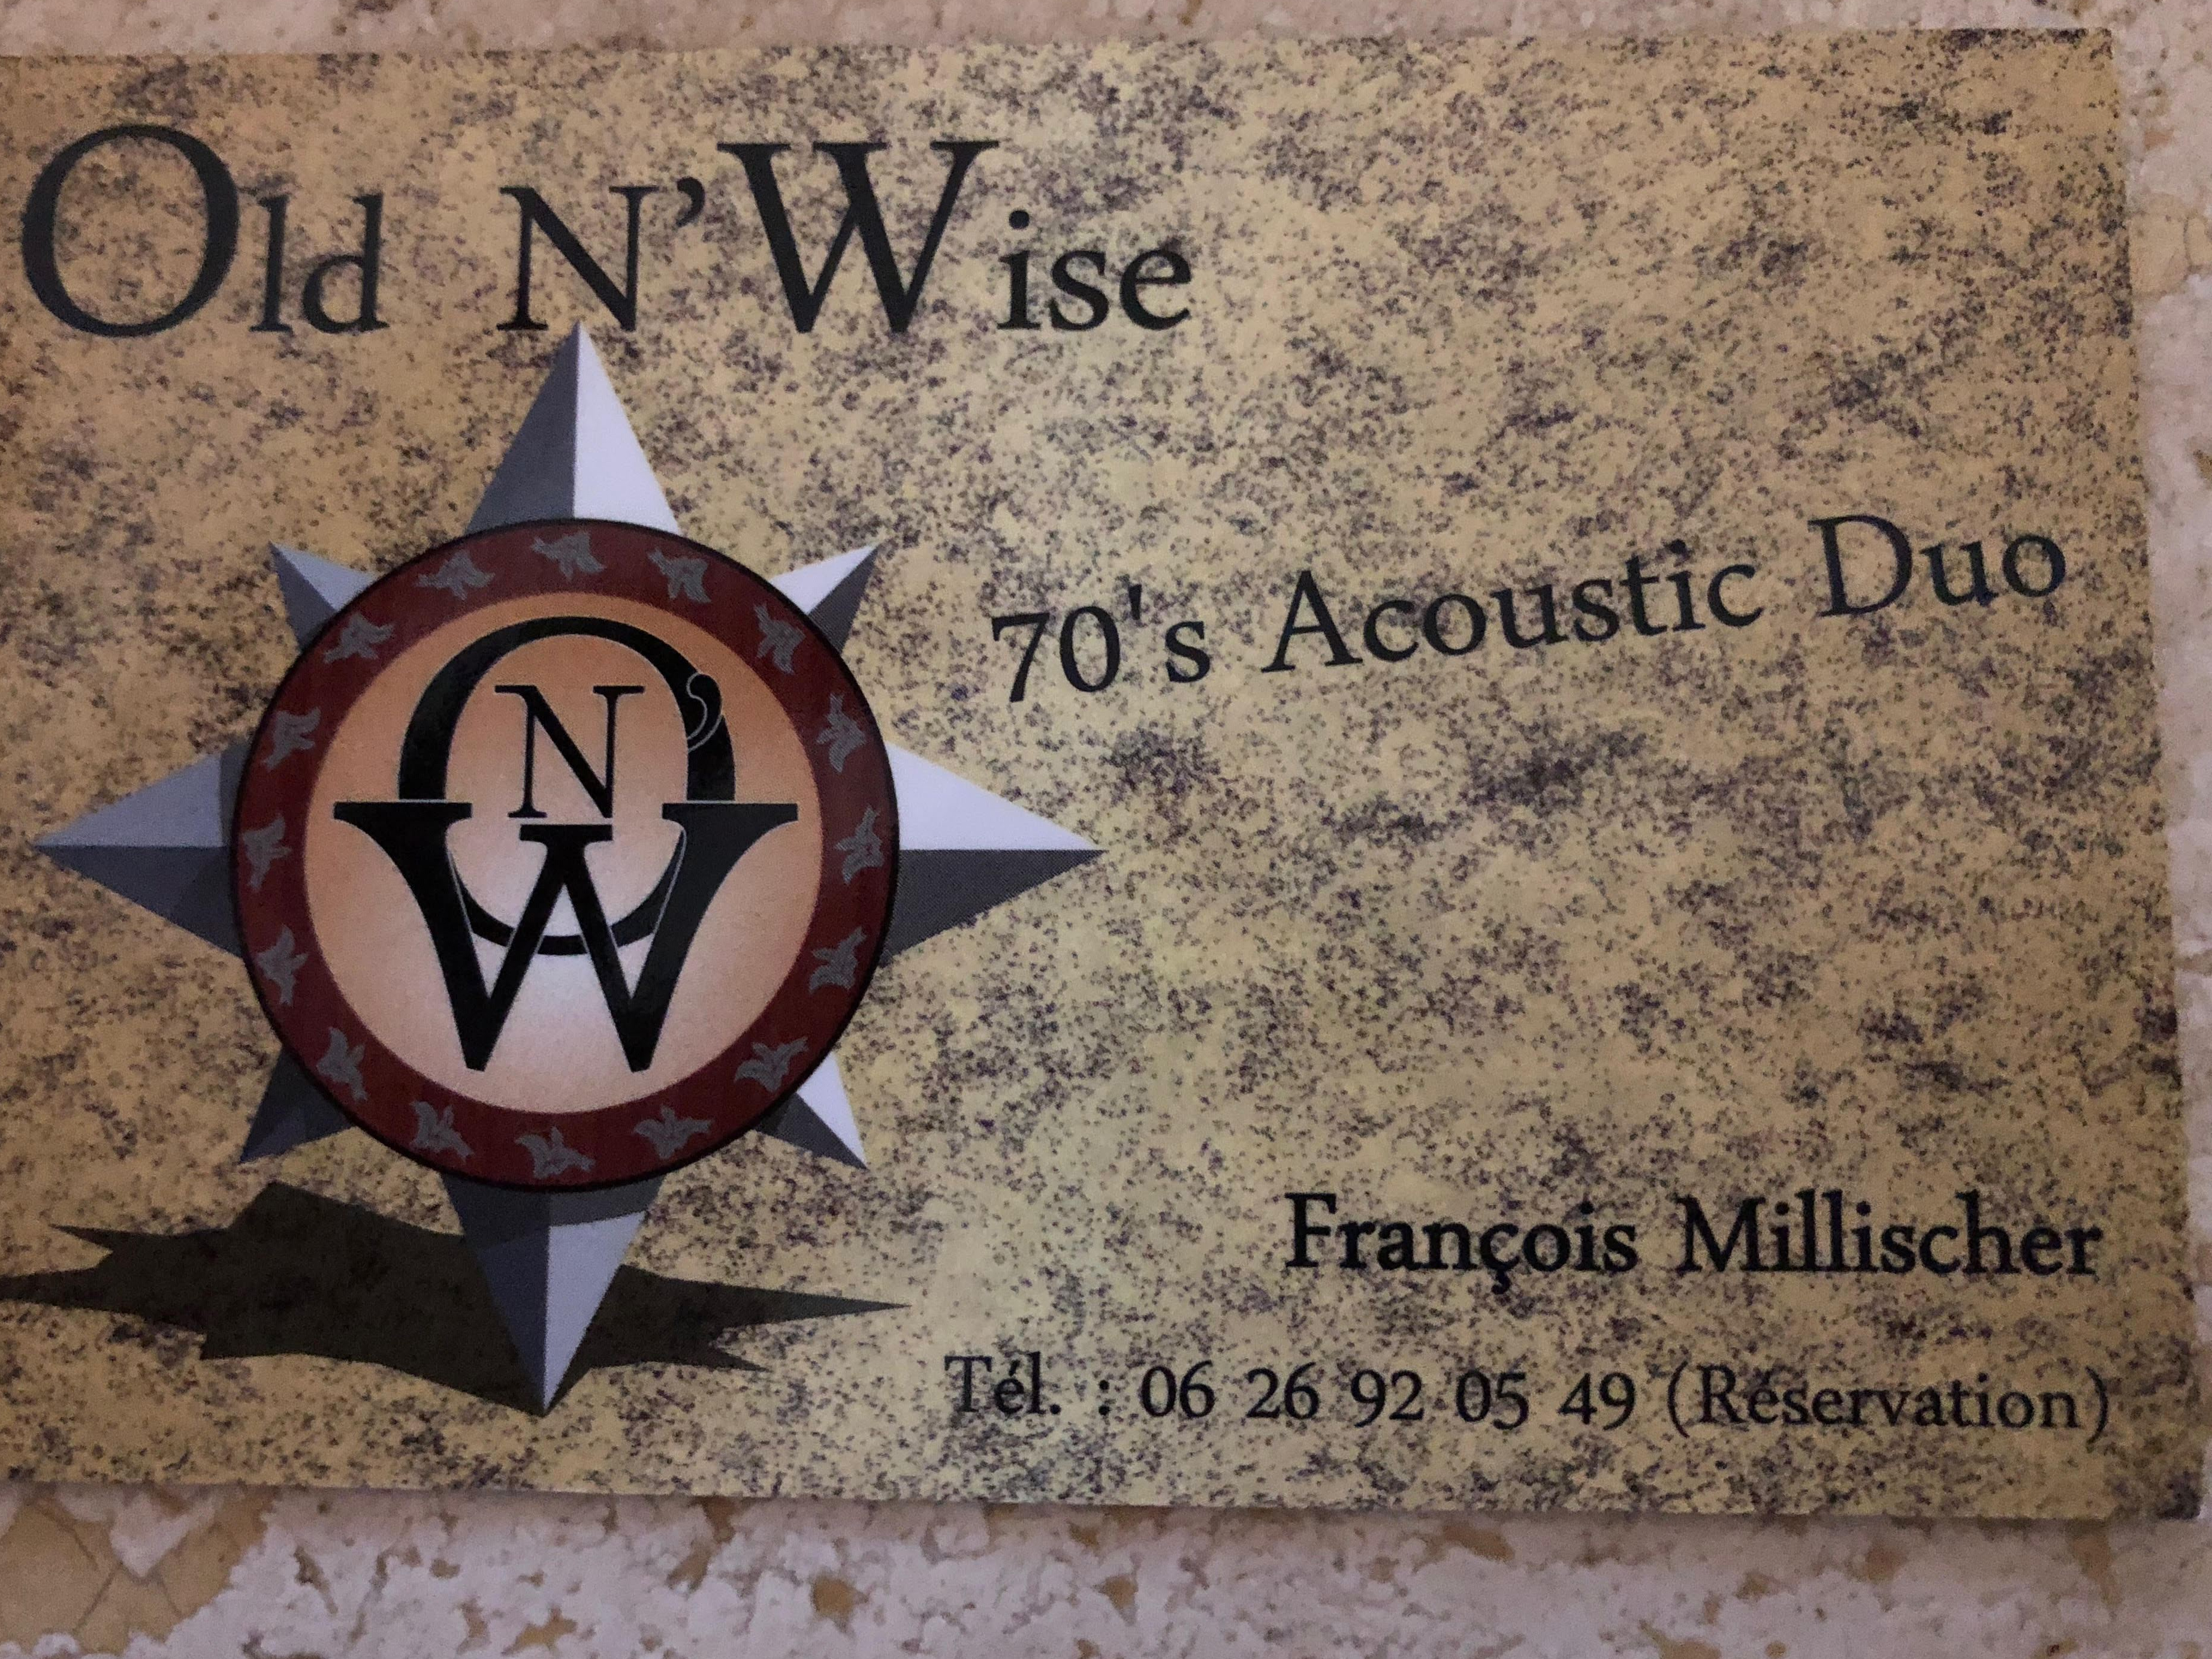 carte de visite Old N'Wise